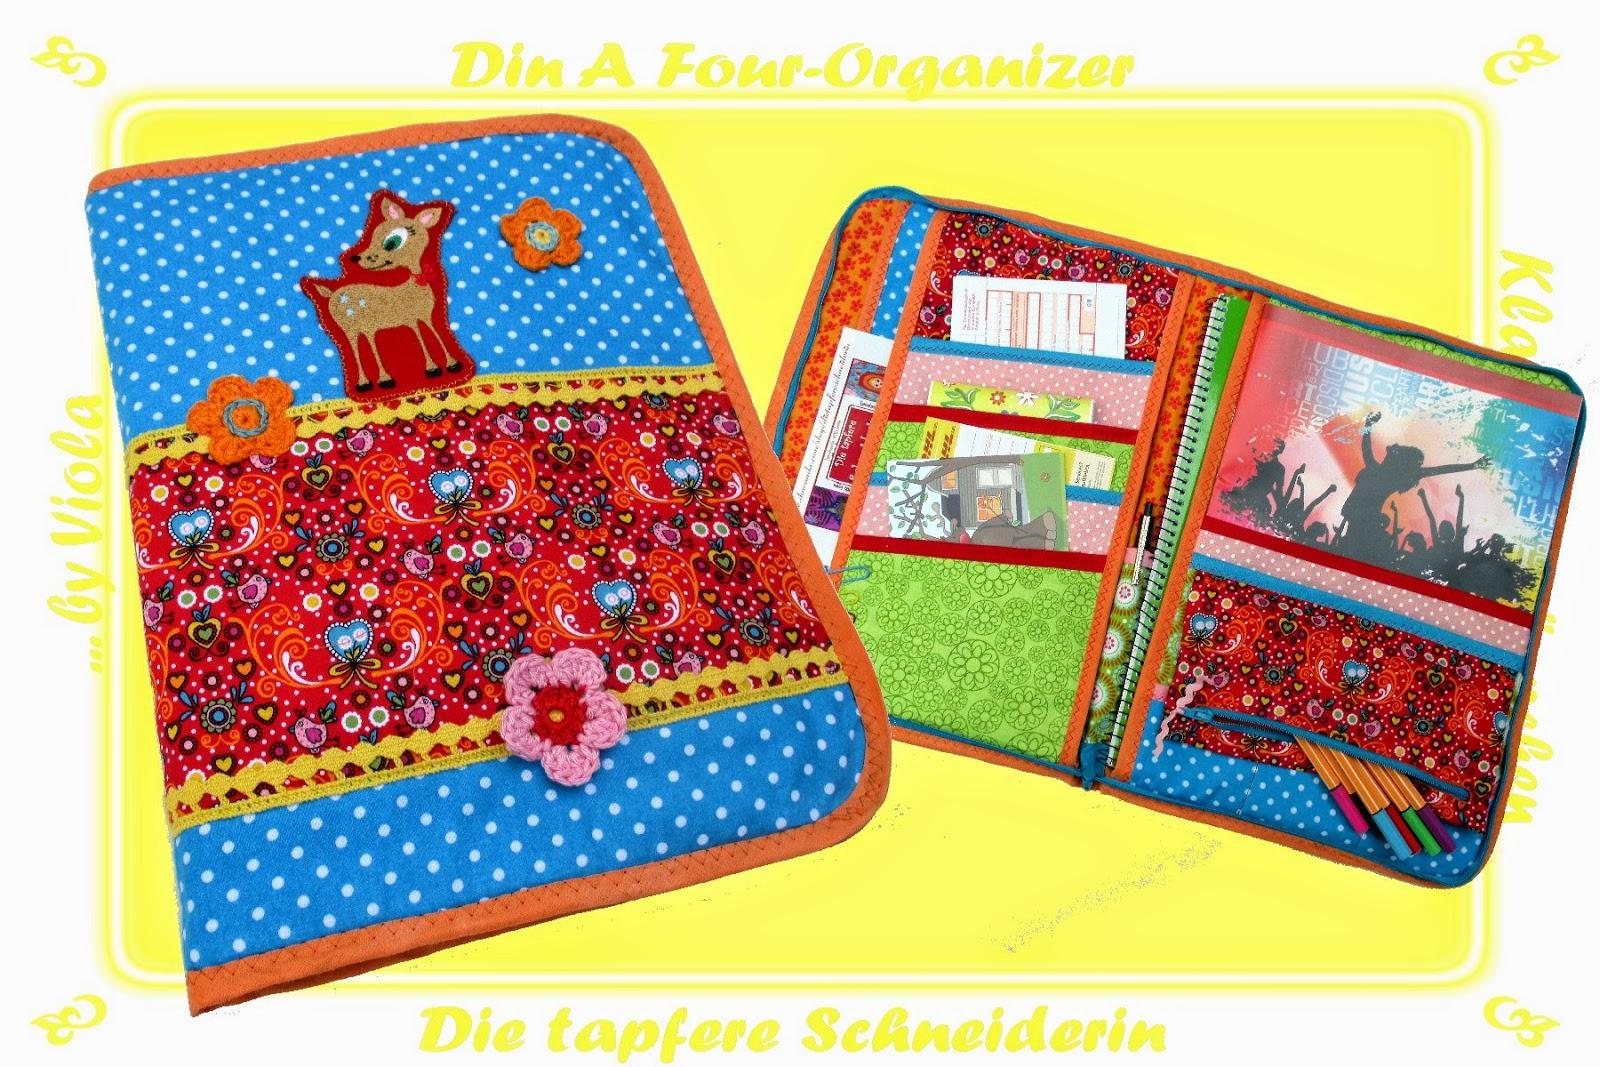 http://de.dawanda.com/product/70832643-Organizer-DinAFour-Kladde-Sammelmappe